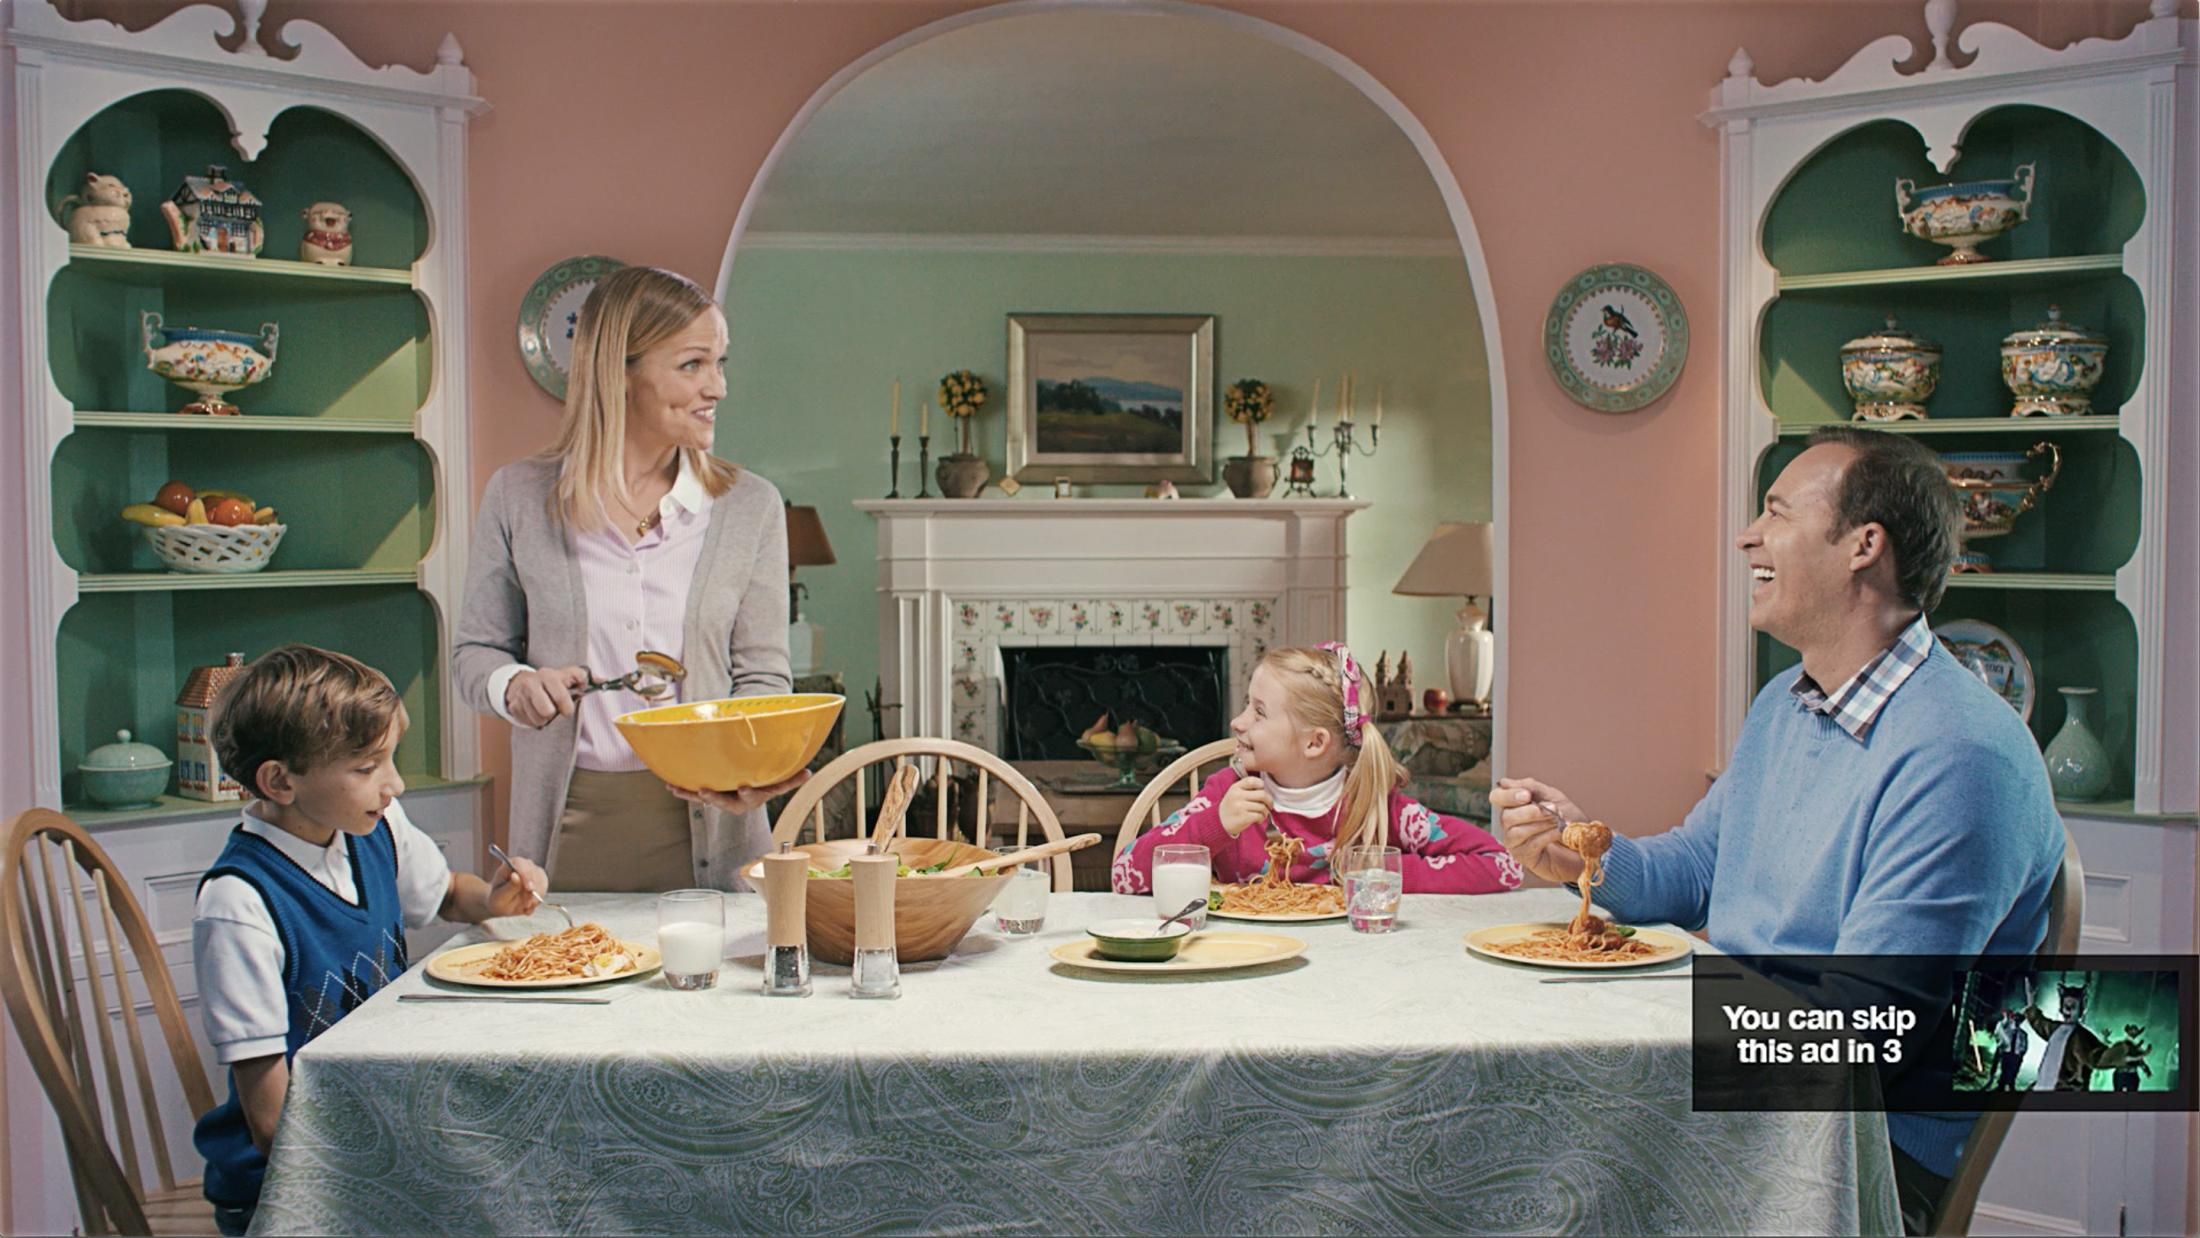 Thumbnail for Unskippable: Family